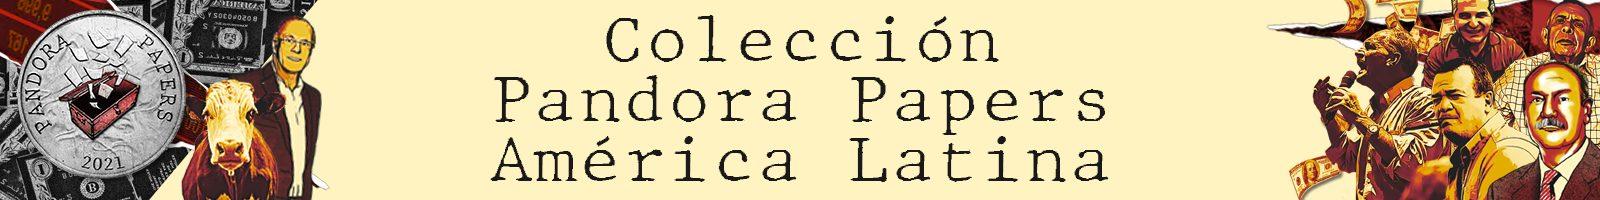 coleccion-latam-banner